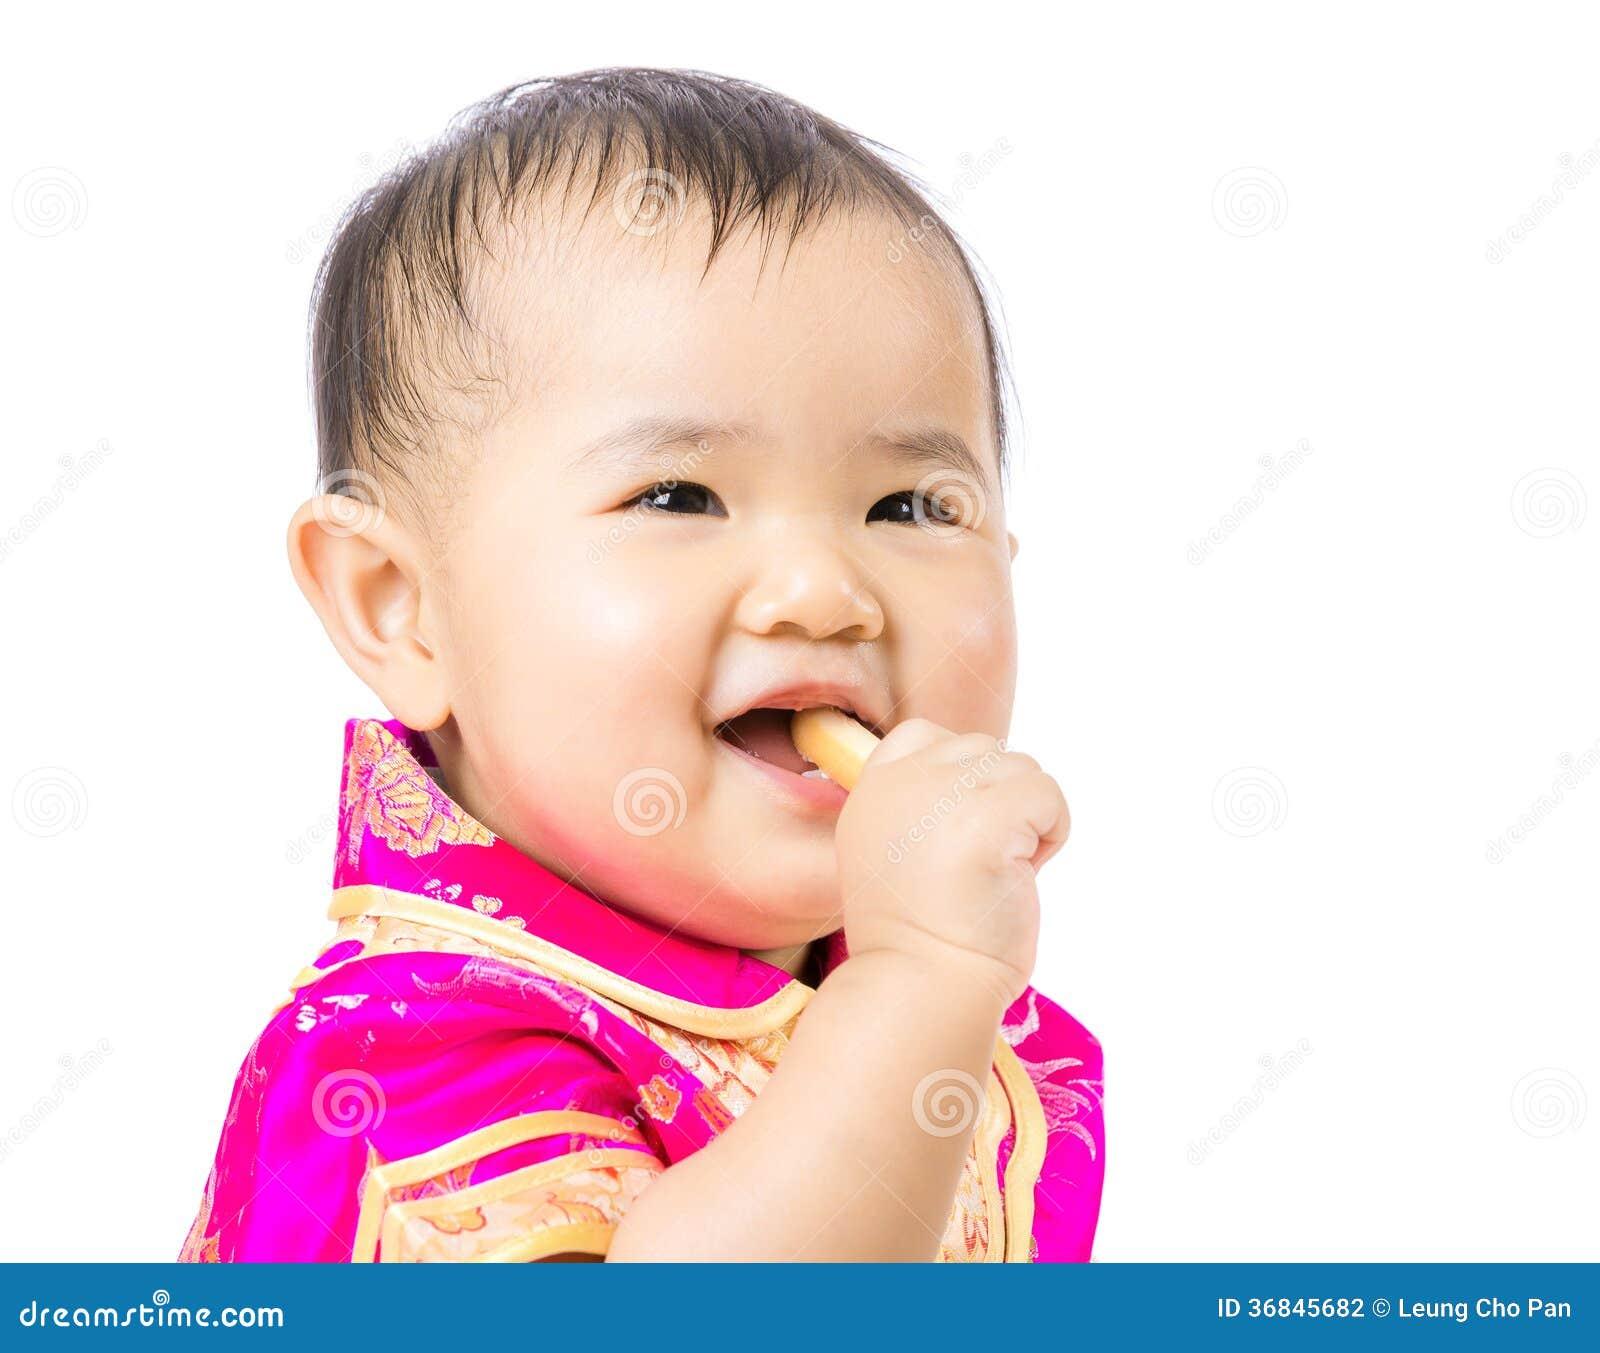 Chinese baby die koekje eten